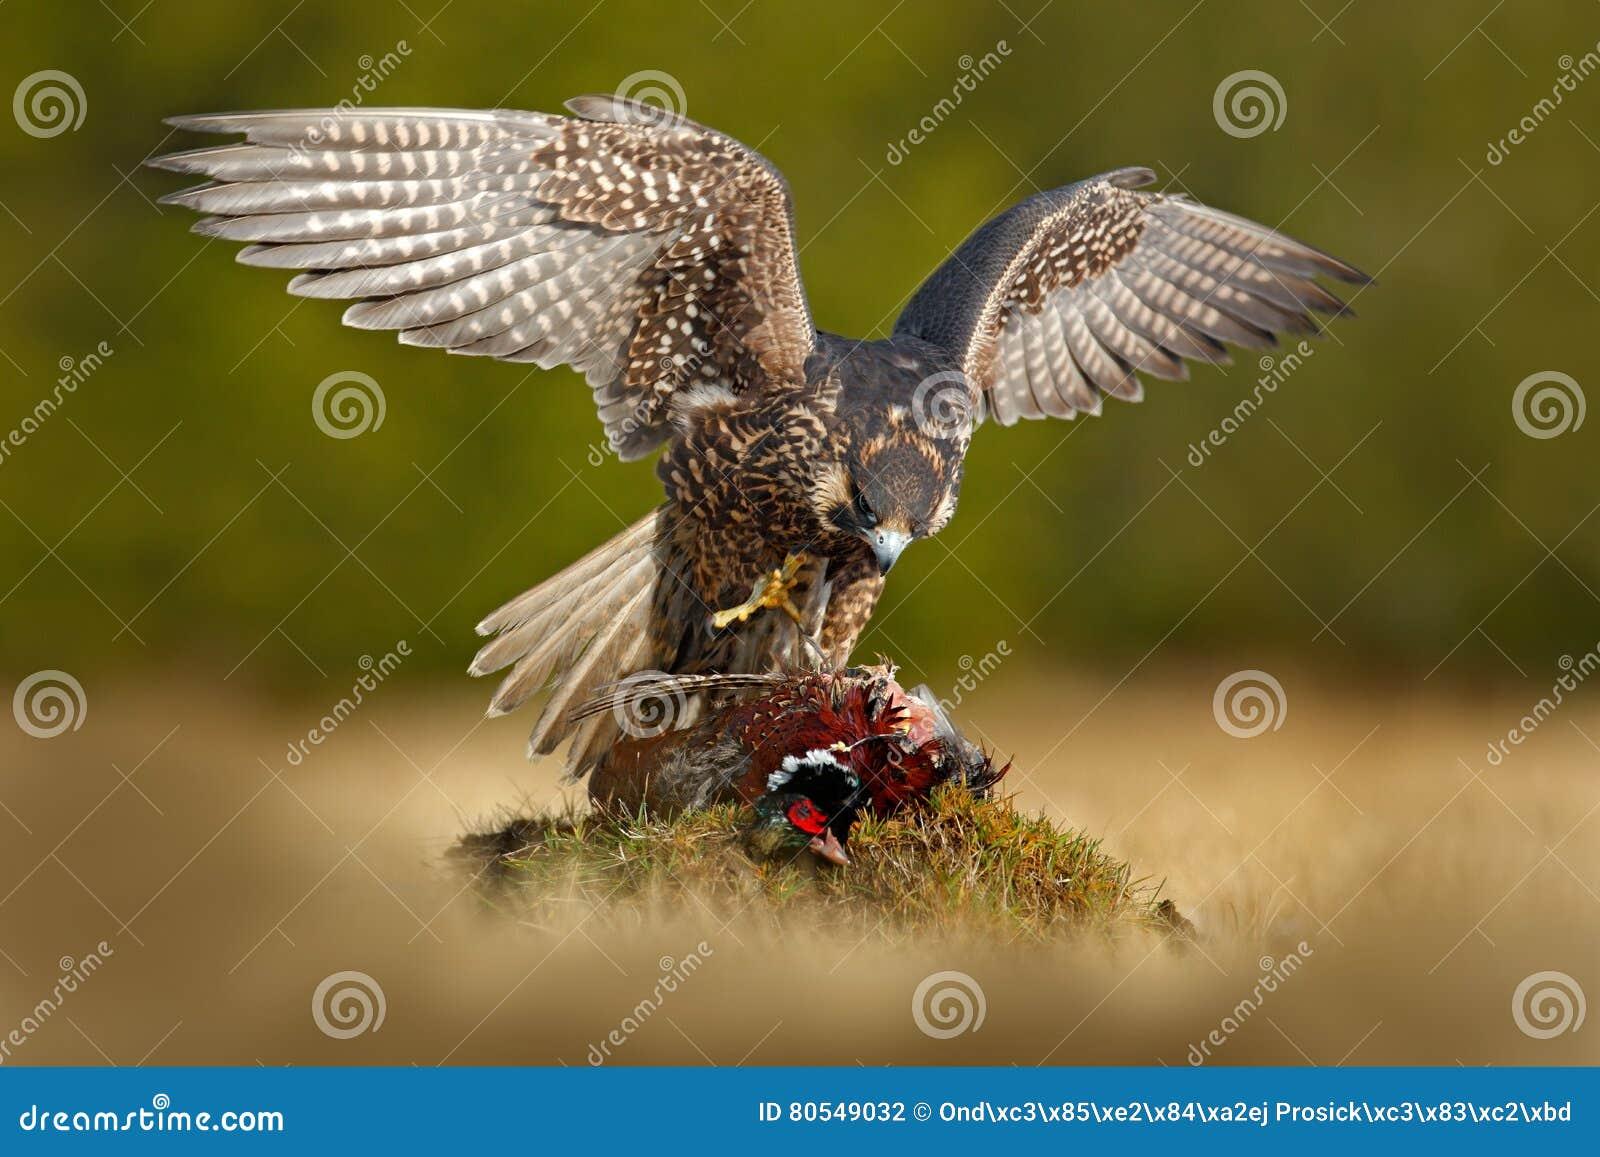 Peregrine falcon with catch Pheasant. Beautiful bird of prey Peregrine Falcon feeding kill big bird on the green moss rock.